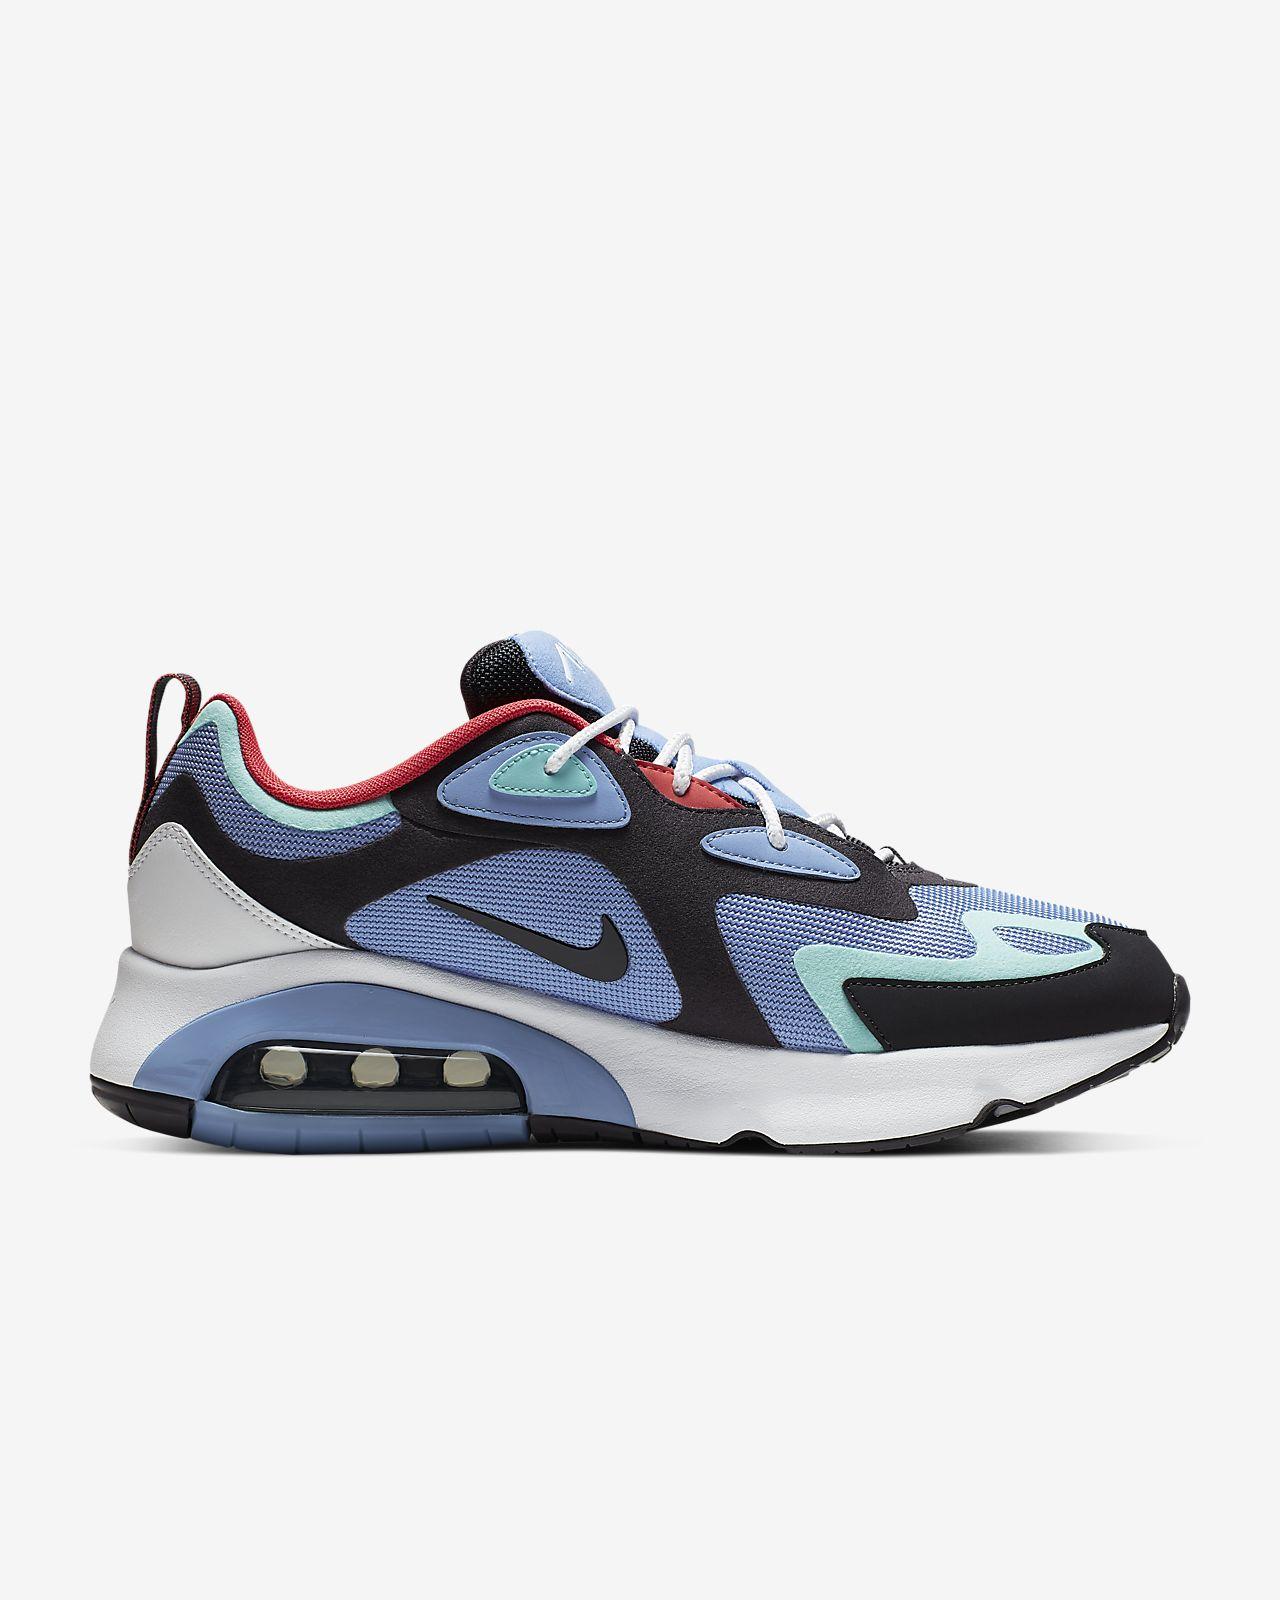 Nike Air Max Sequent 3 Men's Shoe. Nike ZA